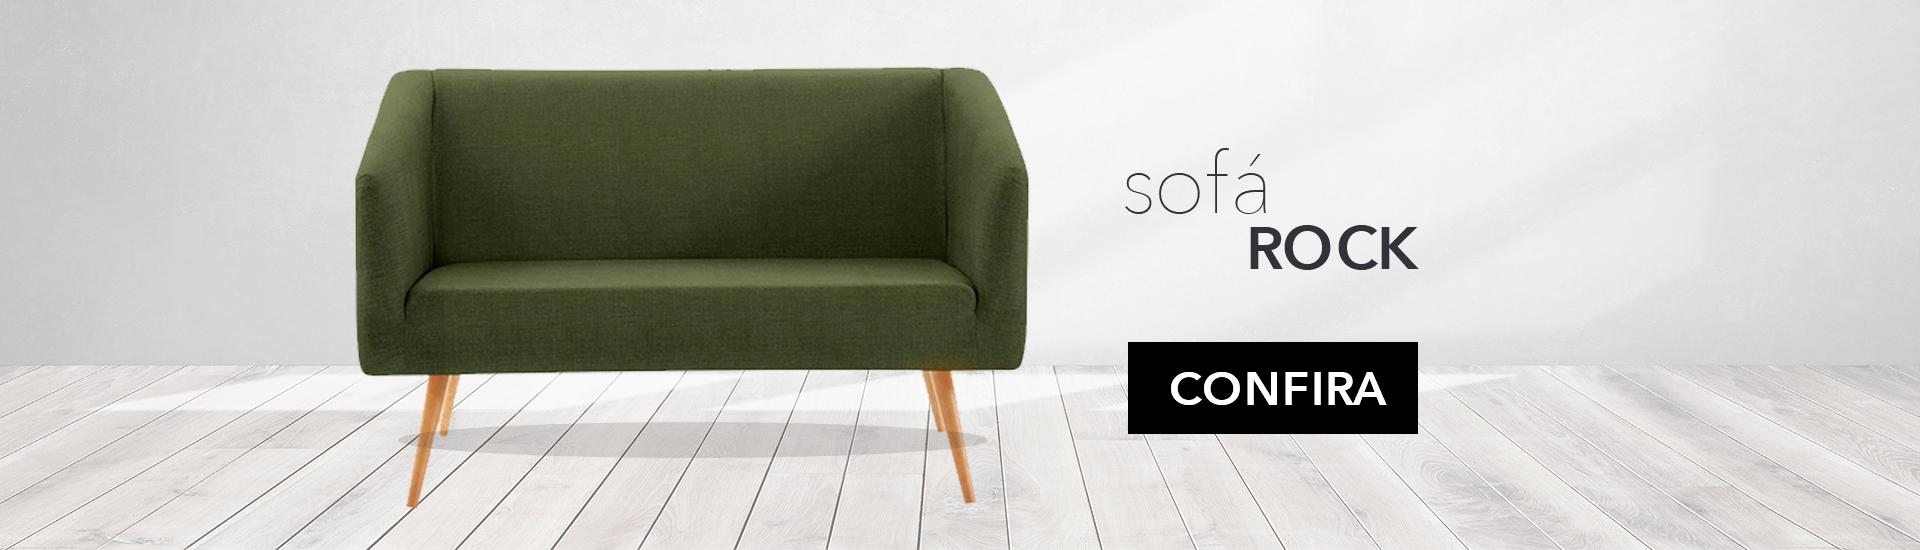 [05/2020 banner 2] sofa